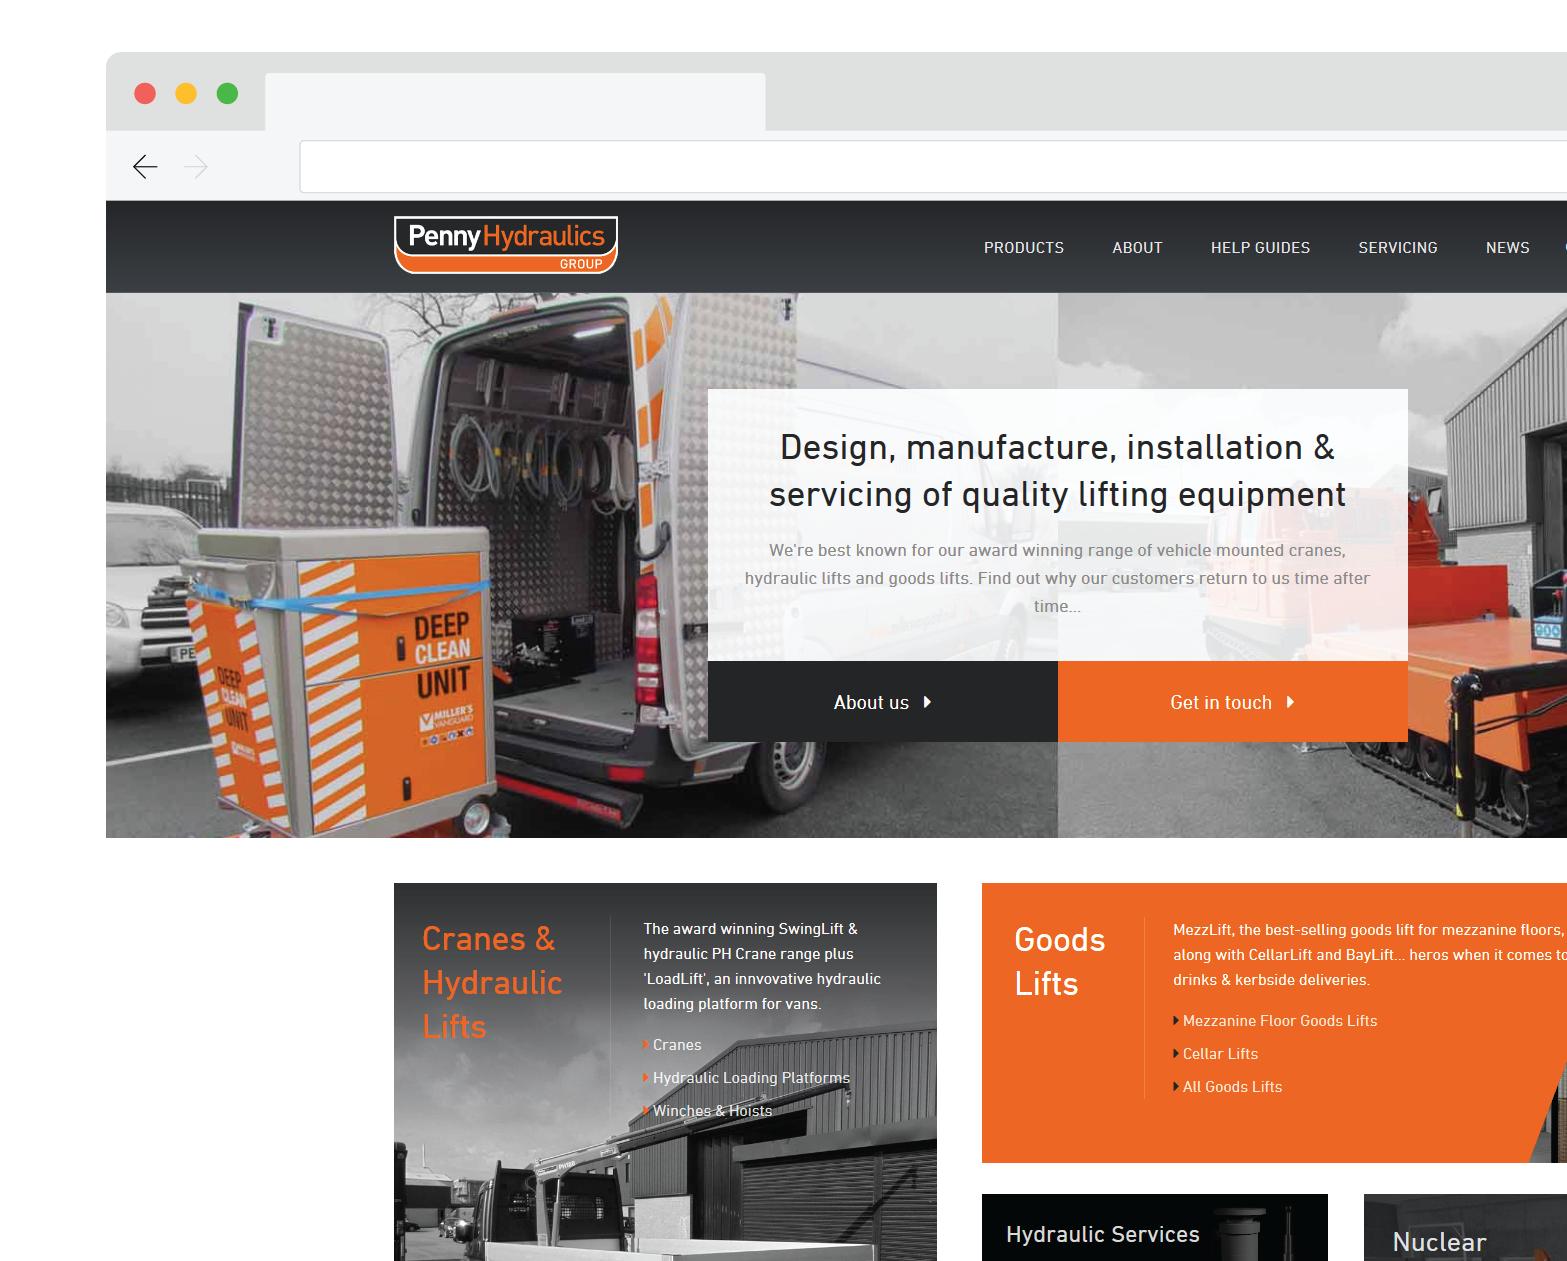 Penny Hydraulics website homepage screenshot